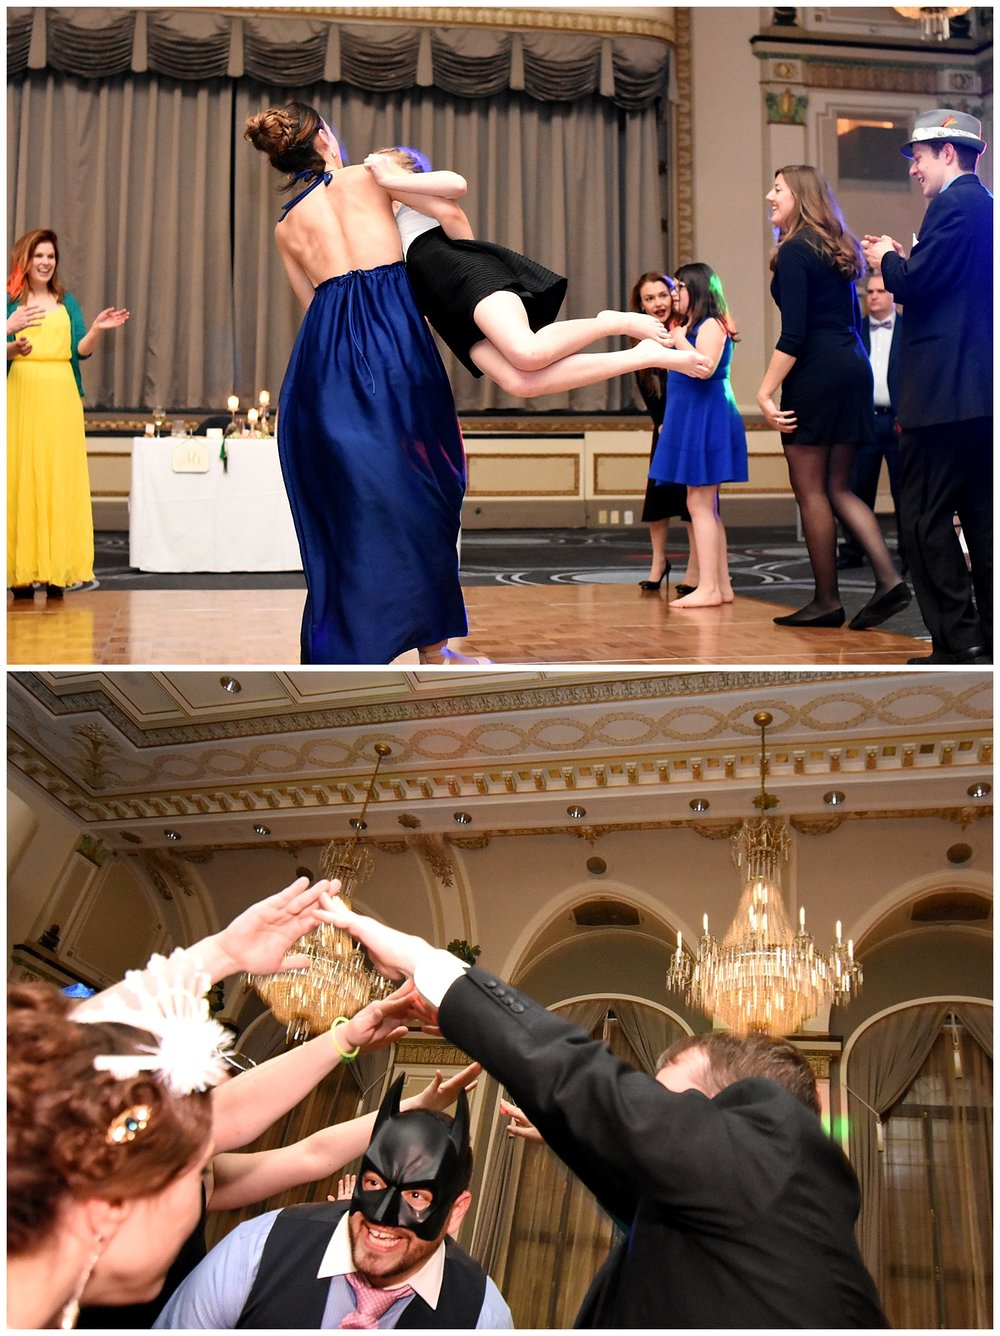 Wedding Guests Dancing | Intimate Wedding Photographer | Chateau de Frontenac | Quebec City Wedding Photographer | Farm Wedding Photographer | Apollo Fields Wedding Photojournalism